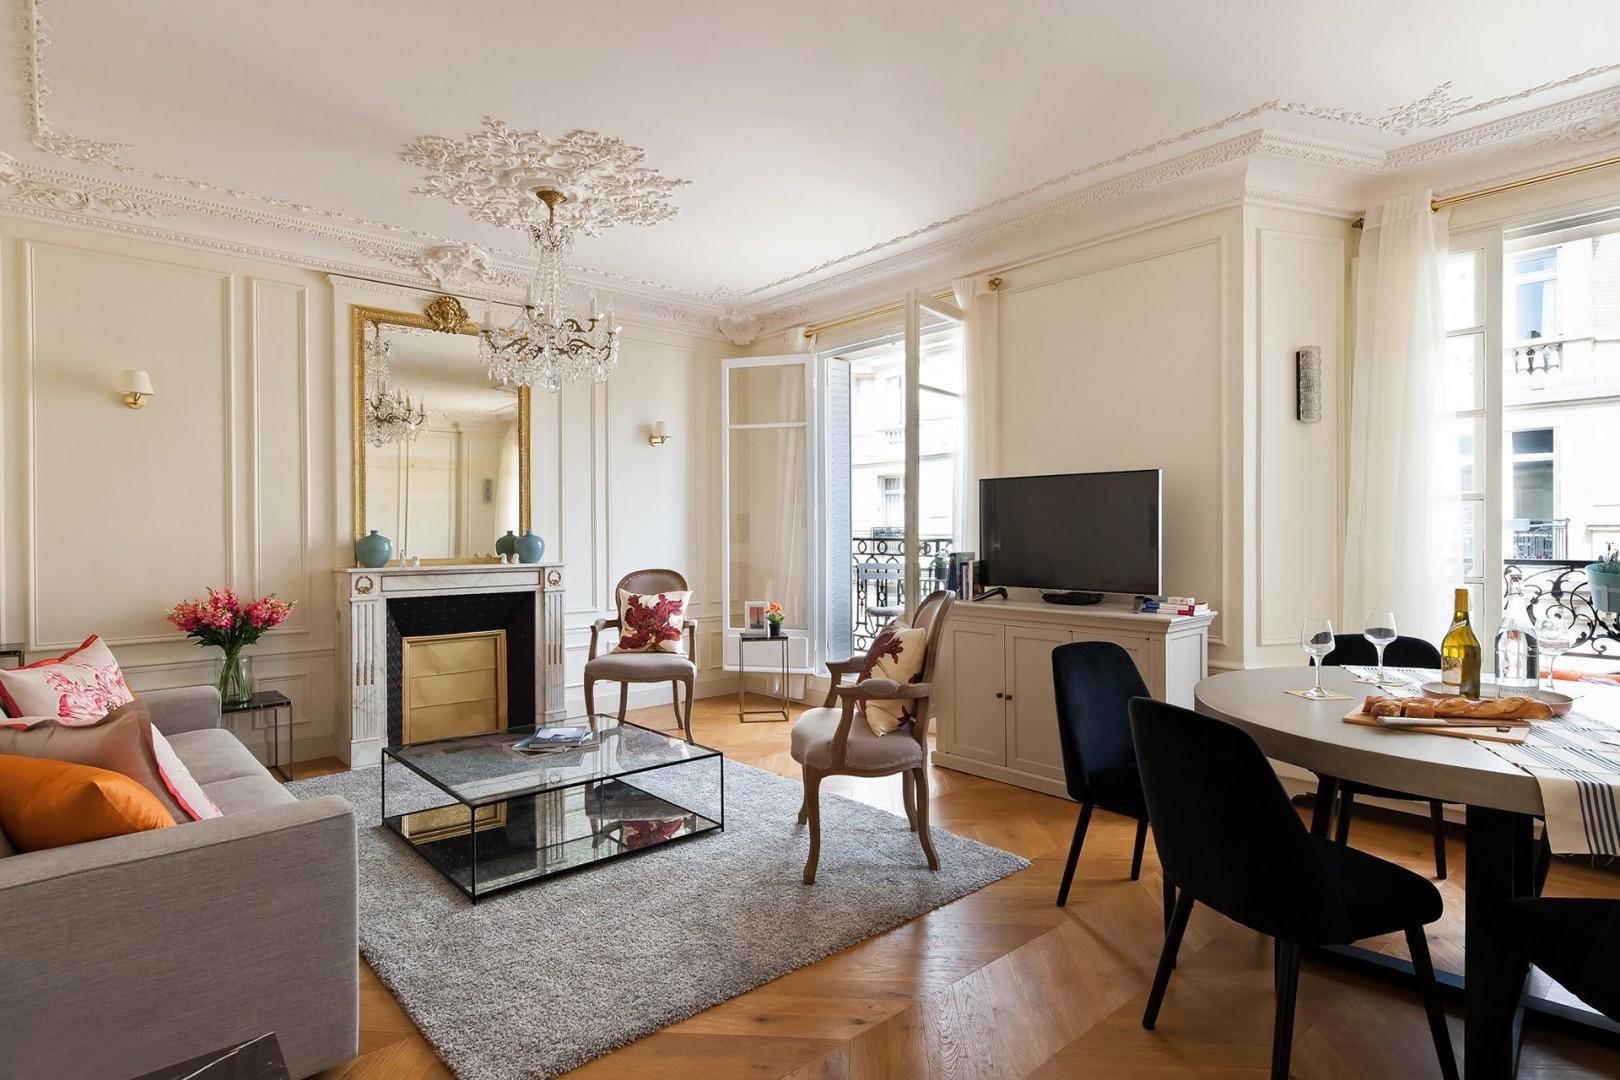 Welcome to our charming Aloxe Paris apartment!